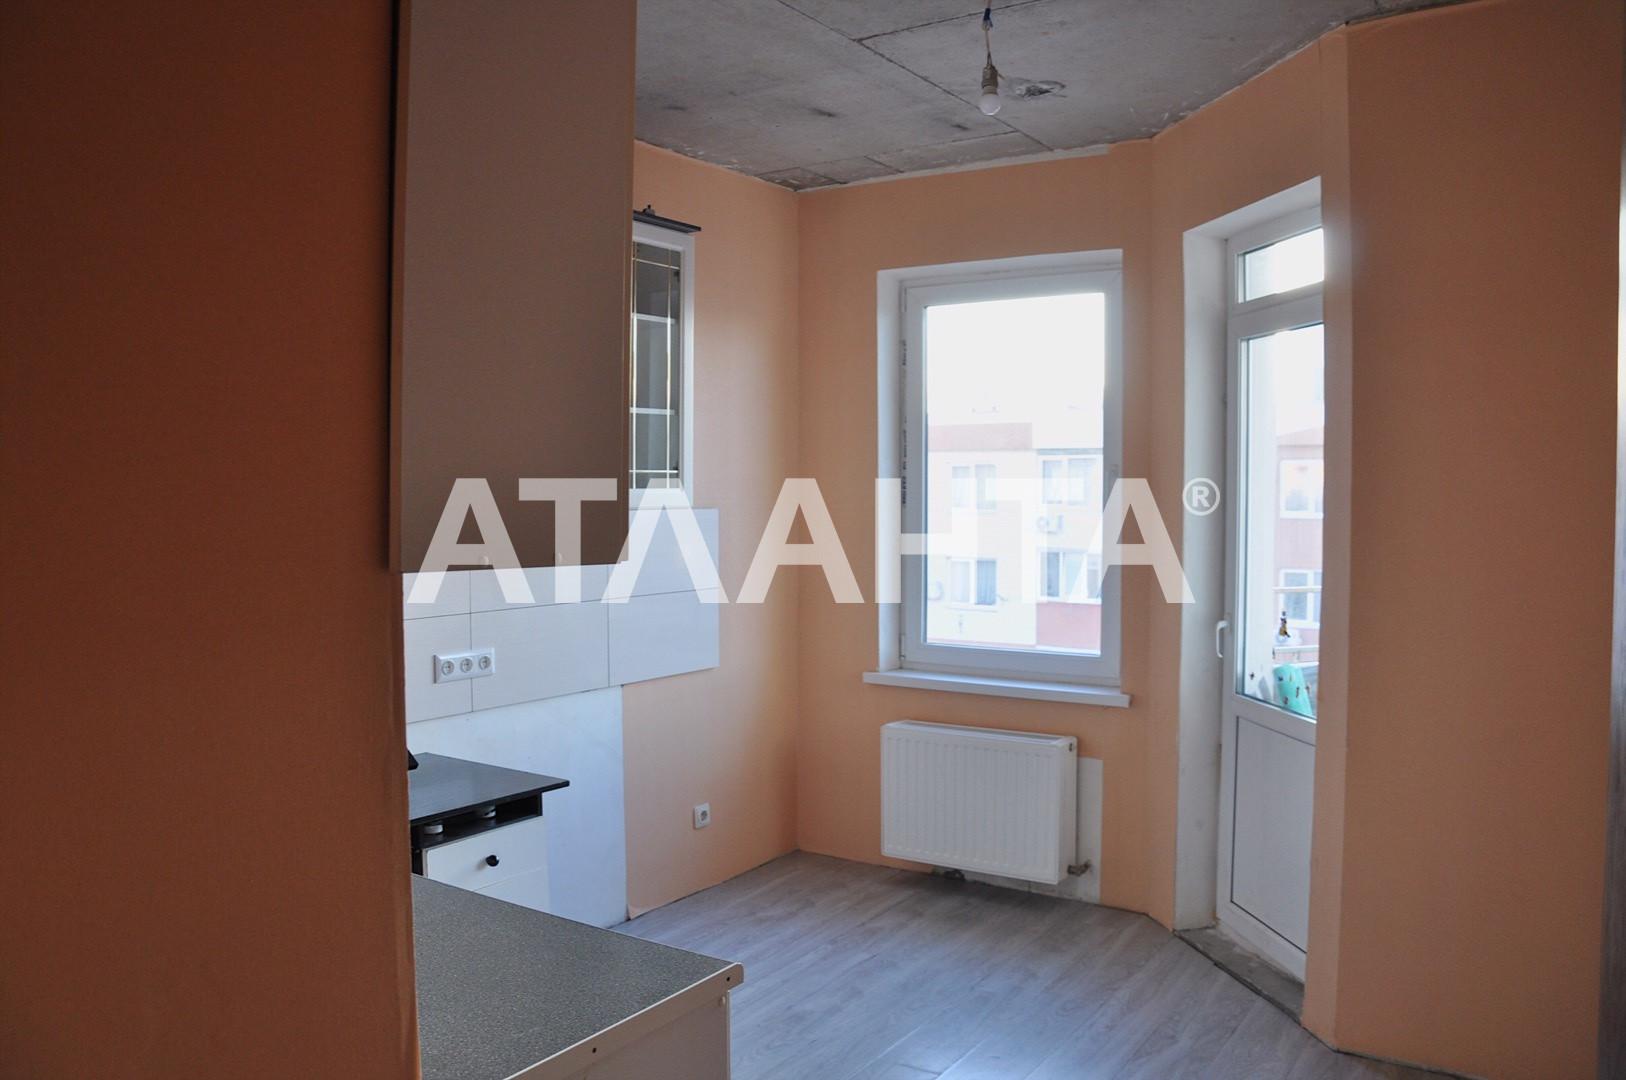 Продается 1-комнатная Квартира на ул. Радужный М-Н — 28 500 у.е. (фото №6)